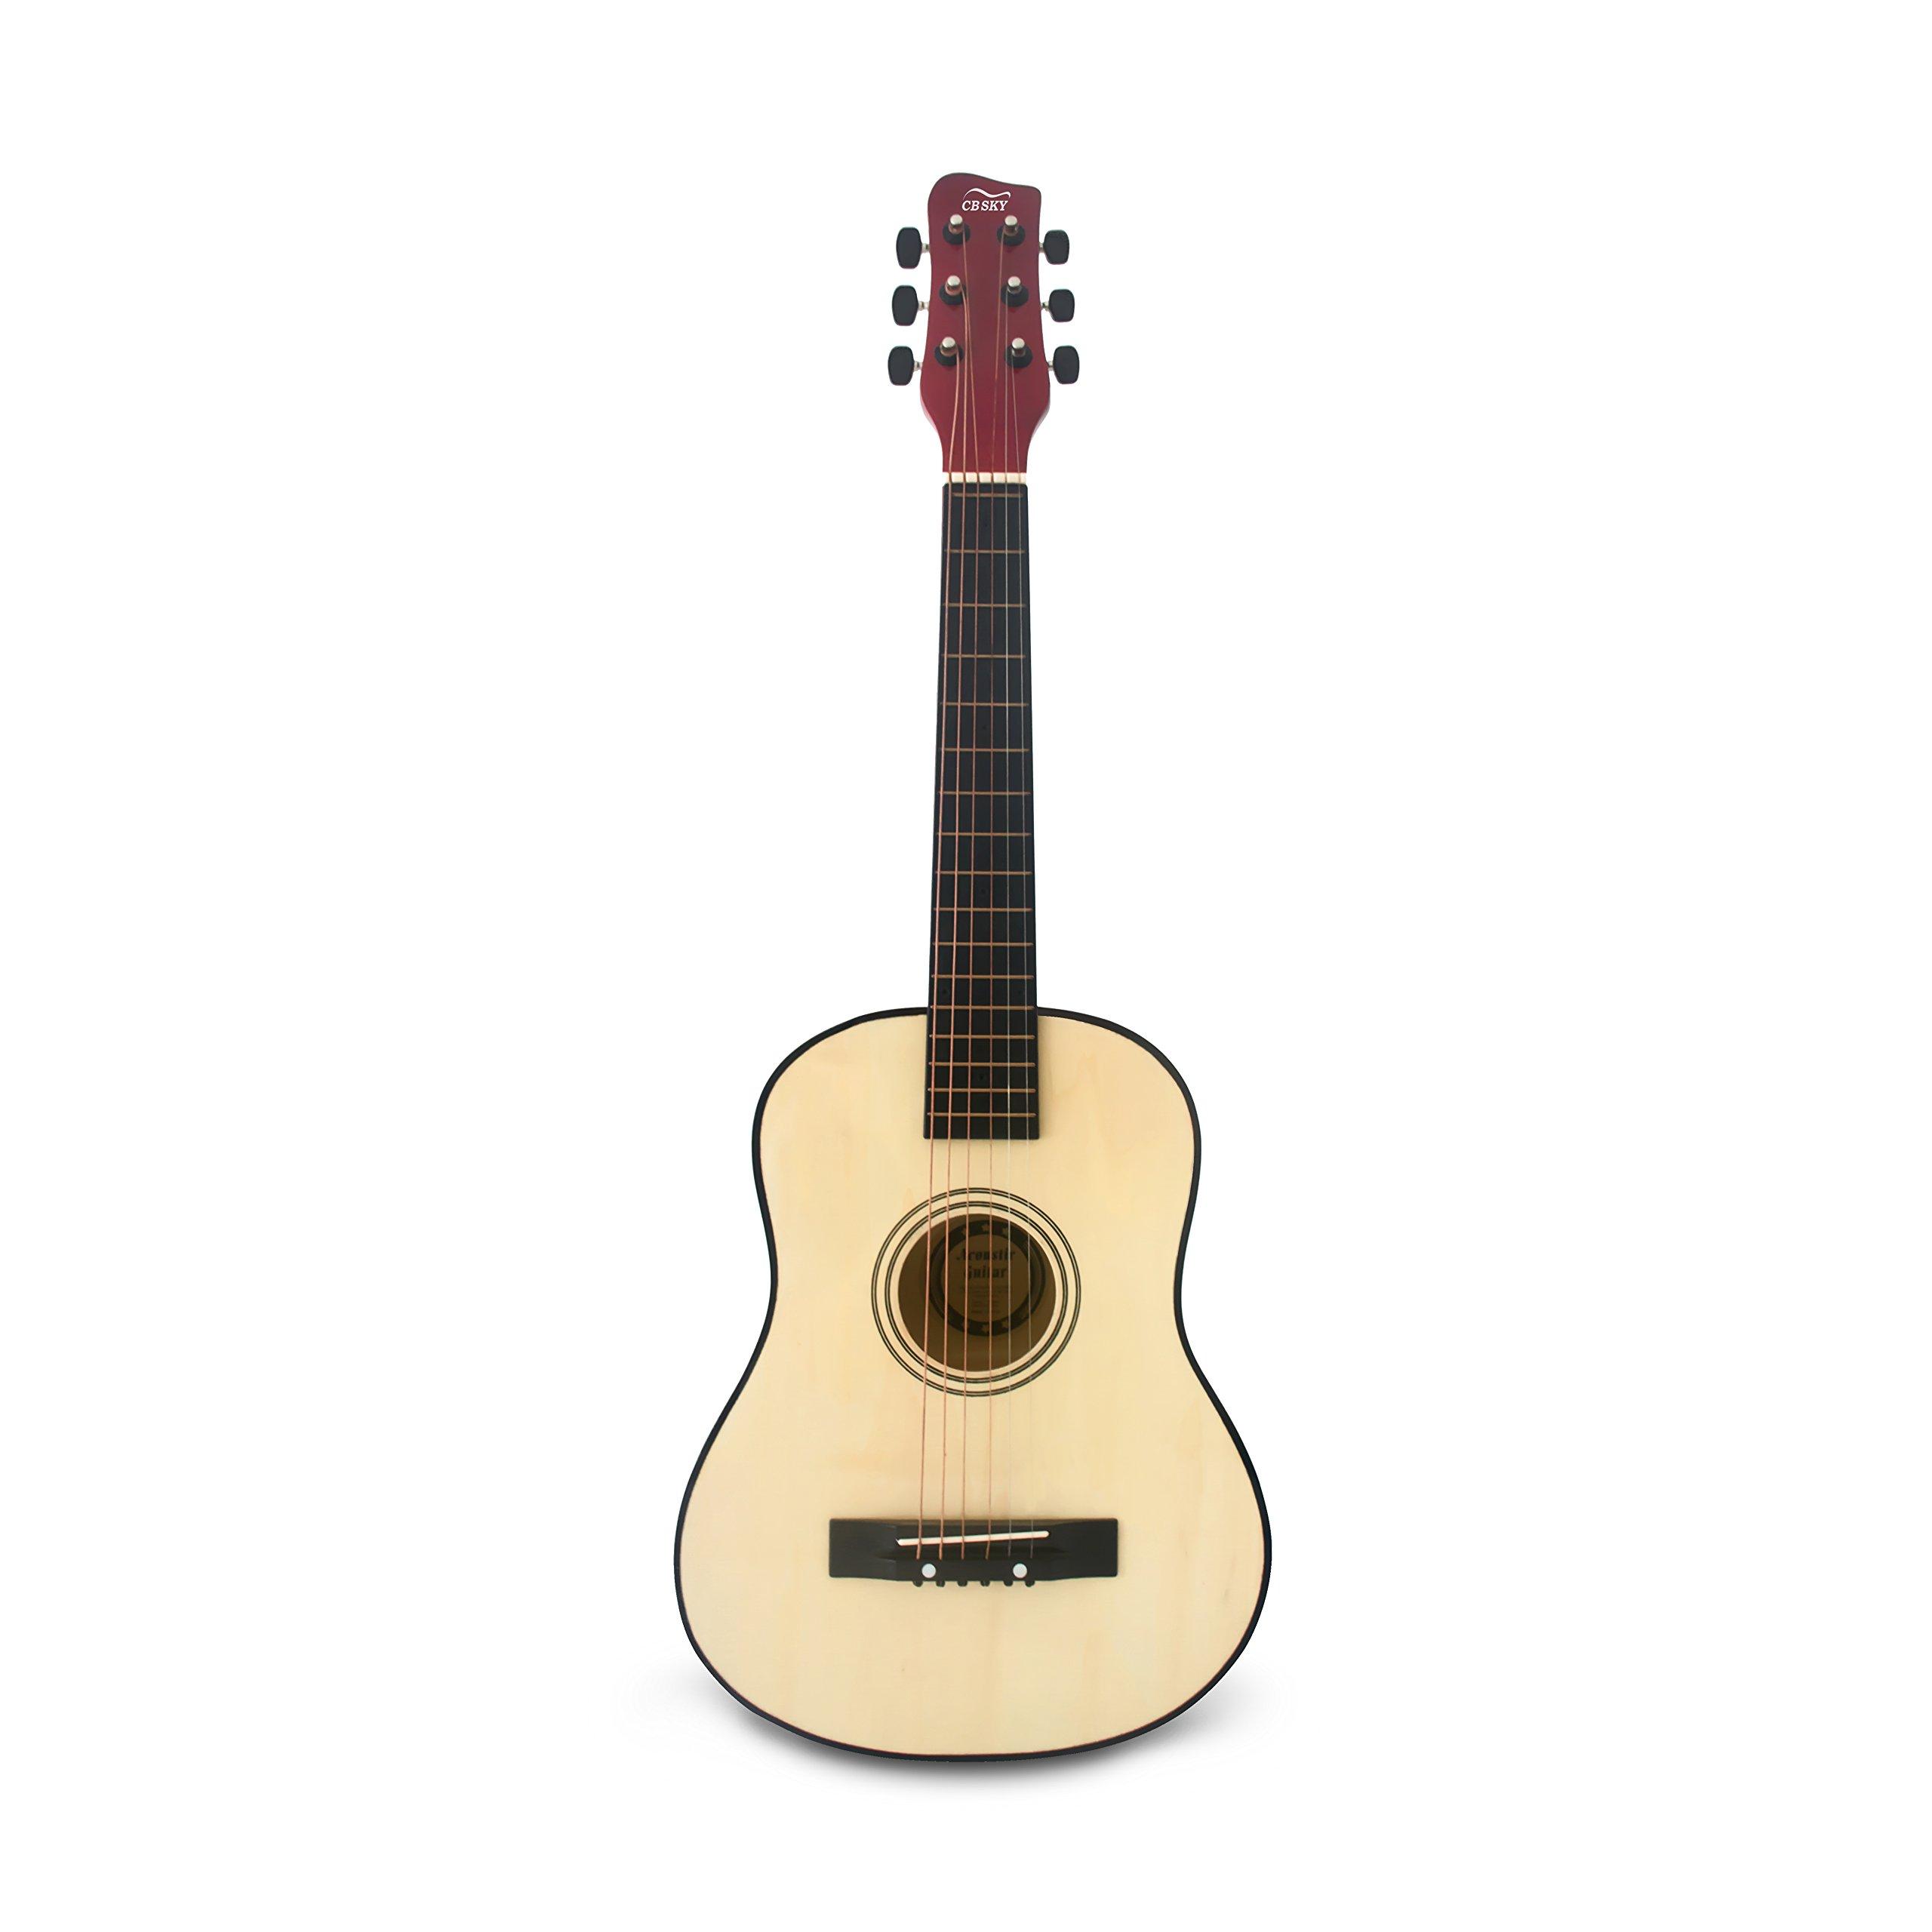 CB SKY 30-inch Junior/ Student Acoustic Guitar/ Beginner/ Kids musical toys, musical instrument